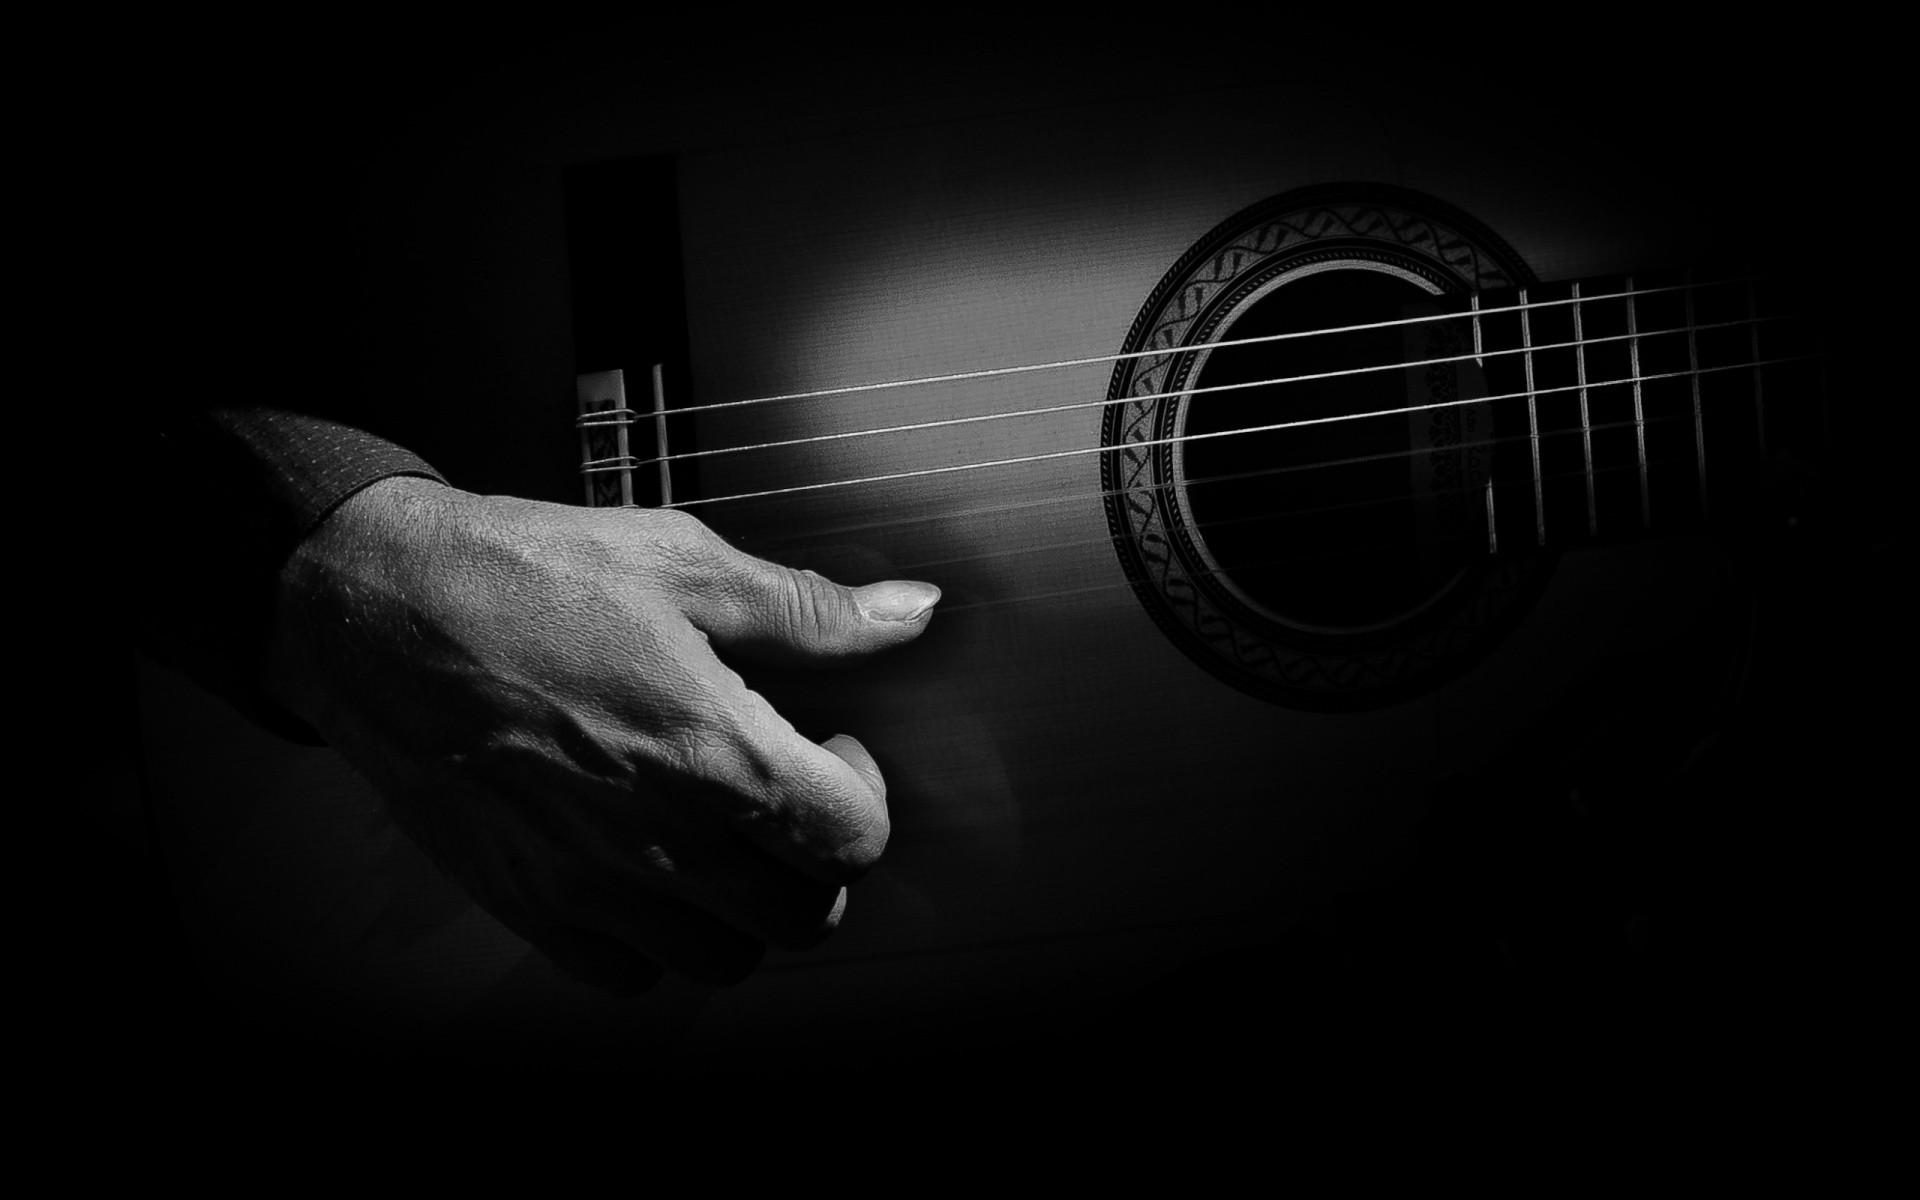 acoustic ibanez guitars wallpaper